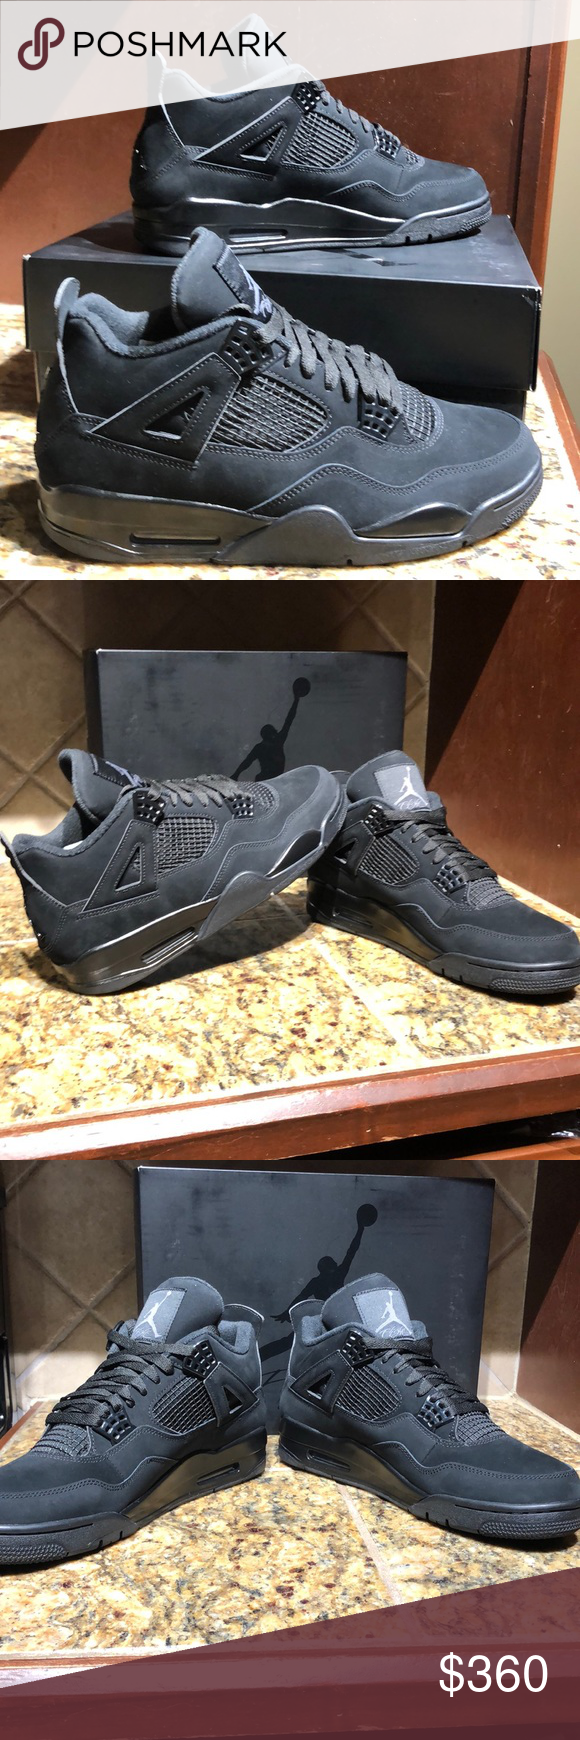 "Just In Air Jordan 4 Retro ""Black Cat"" Won these in a"